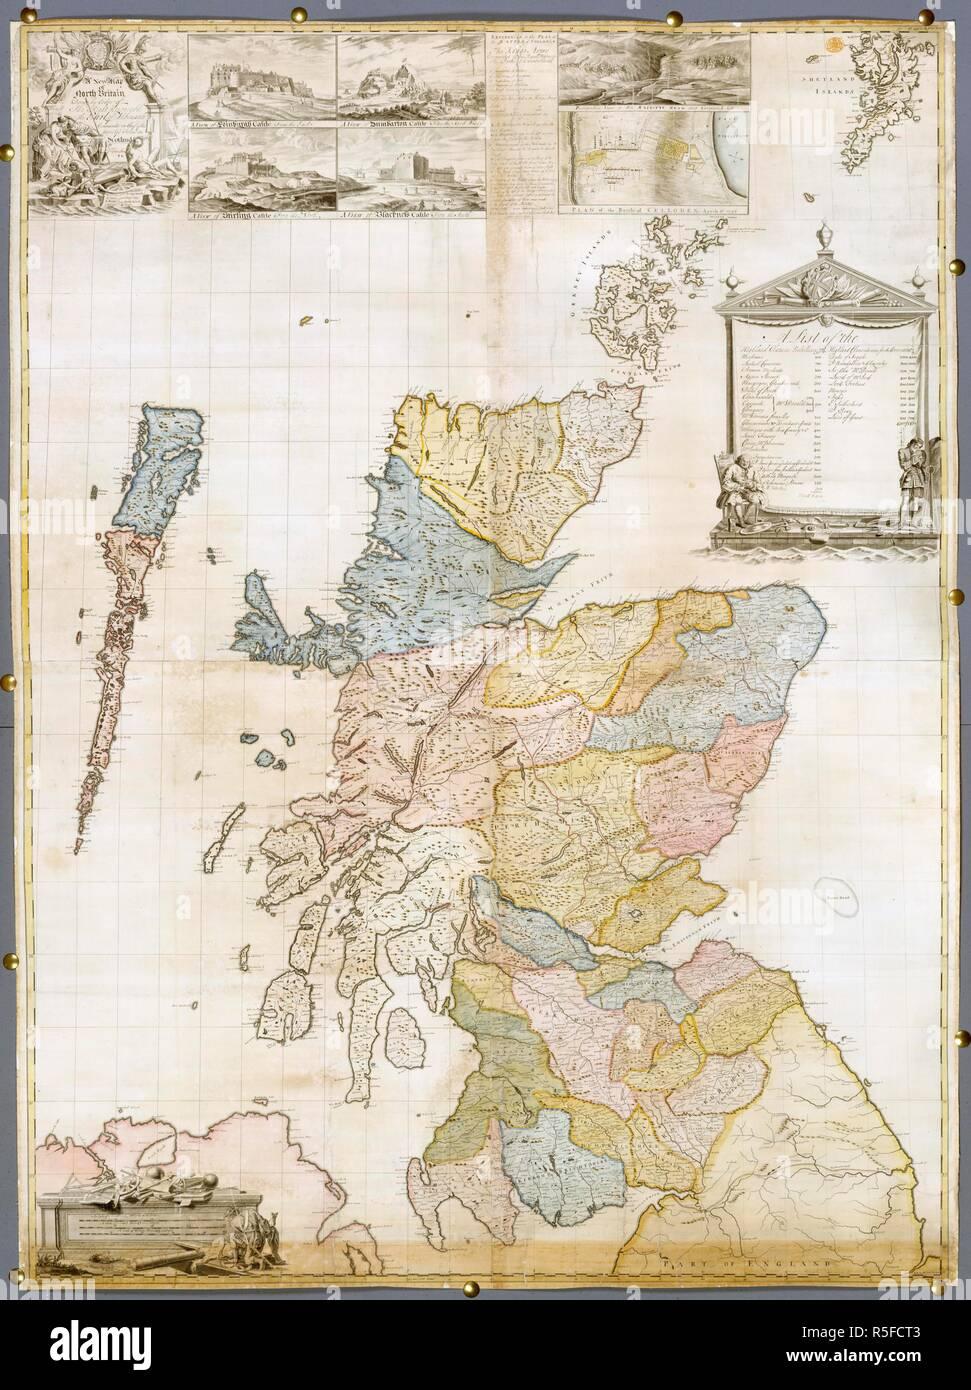 Carte Angleterre Grande Bretagne.Le Nord De La Grande Bretagne Une Carte En Couleur De L